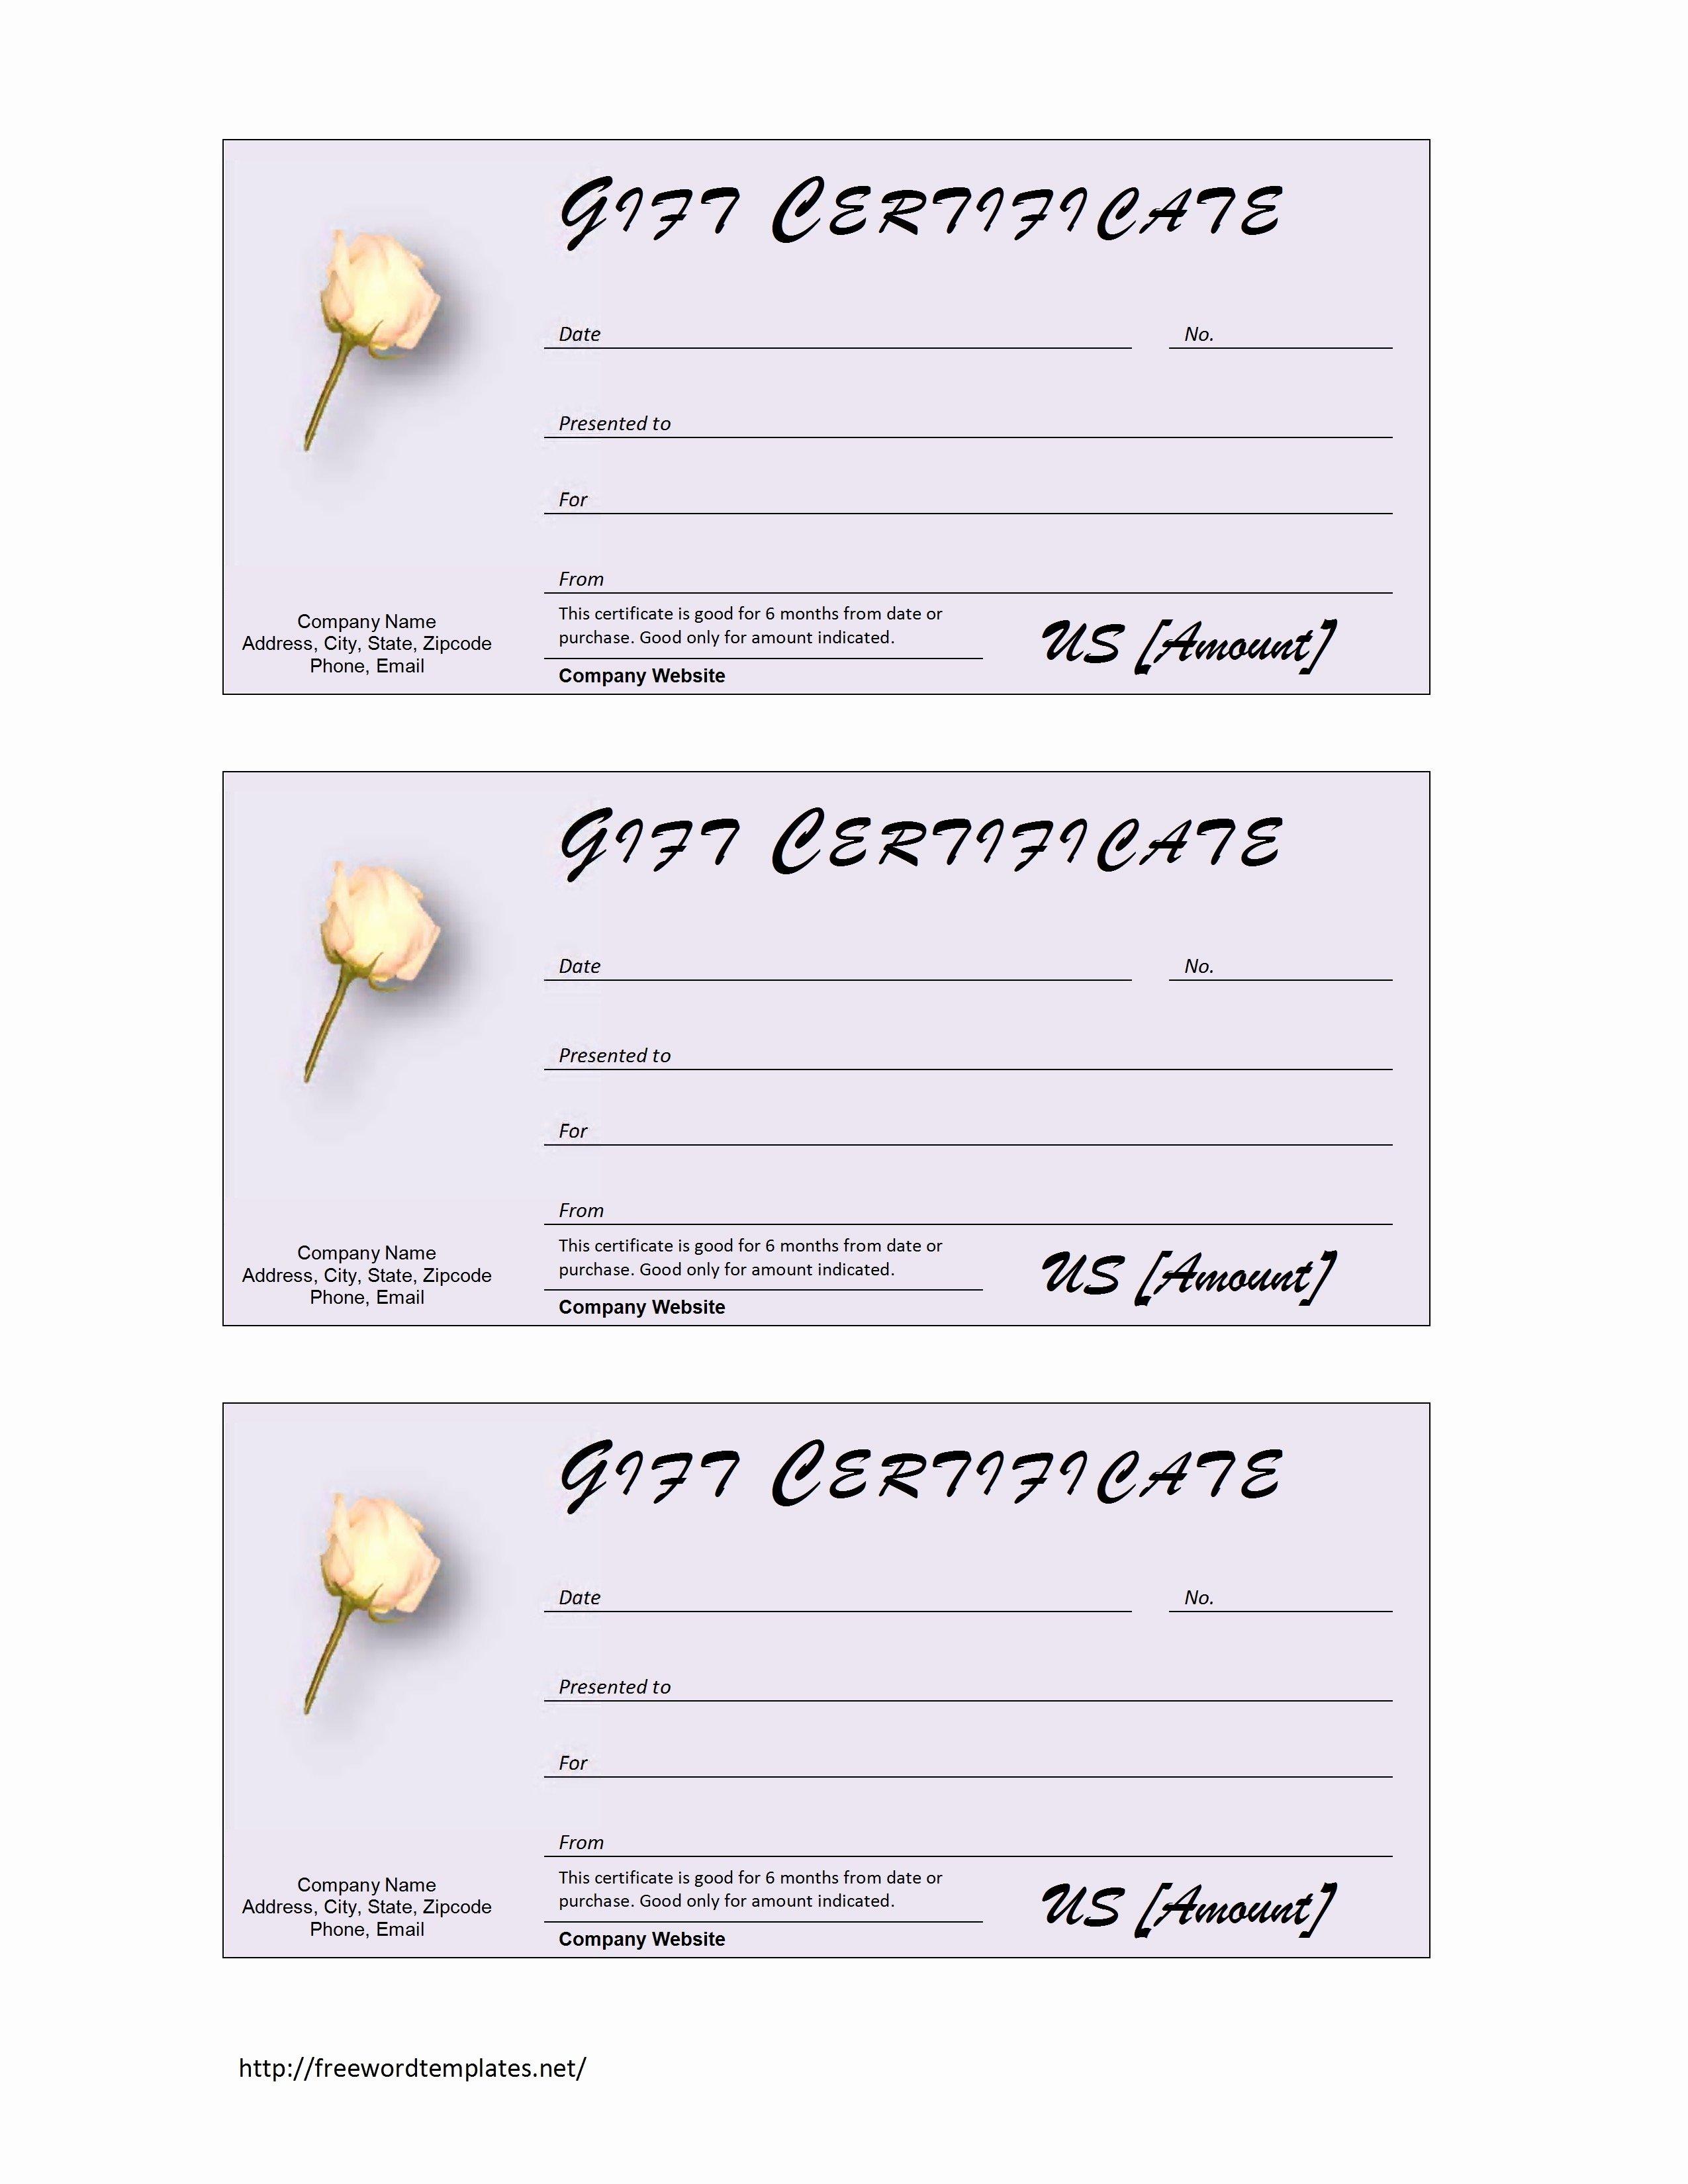 Fitness Gift Certificate Template Lovely Blank Gift Certificate Template Mughals